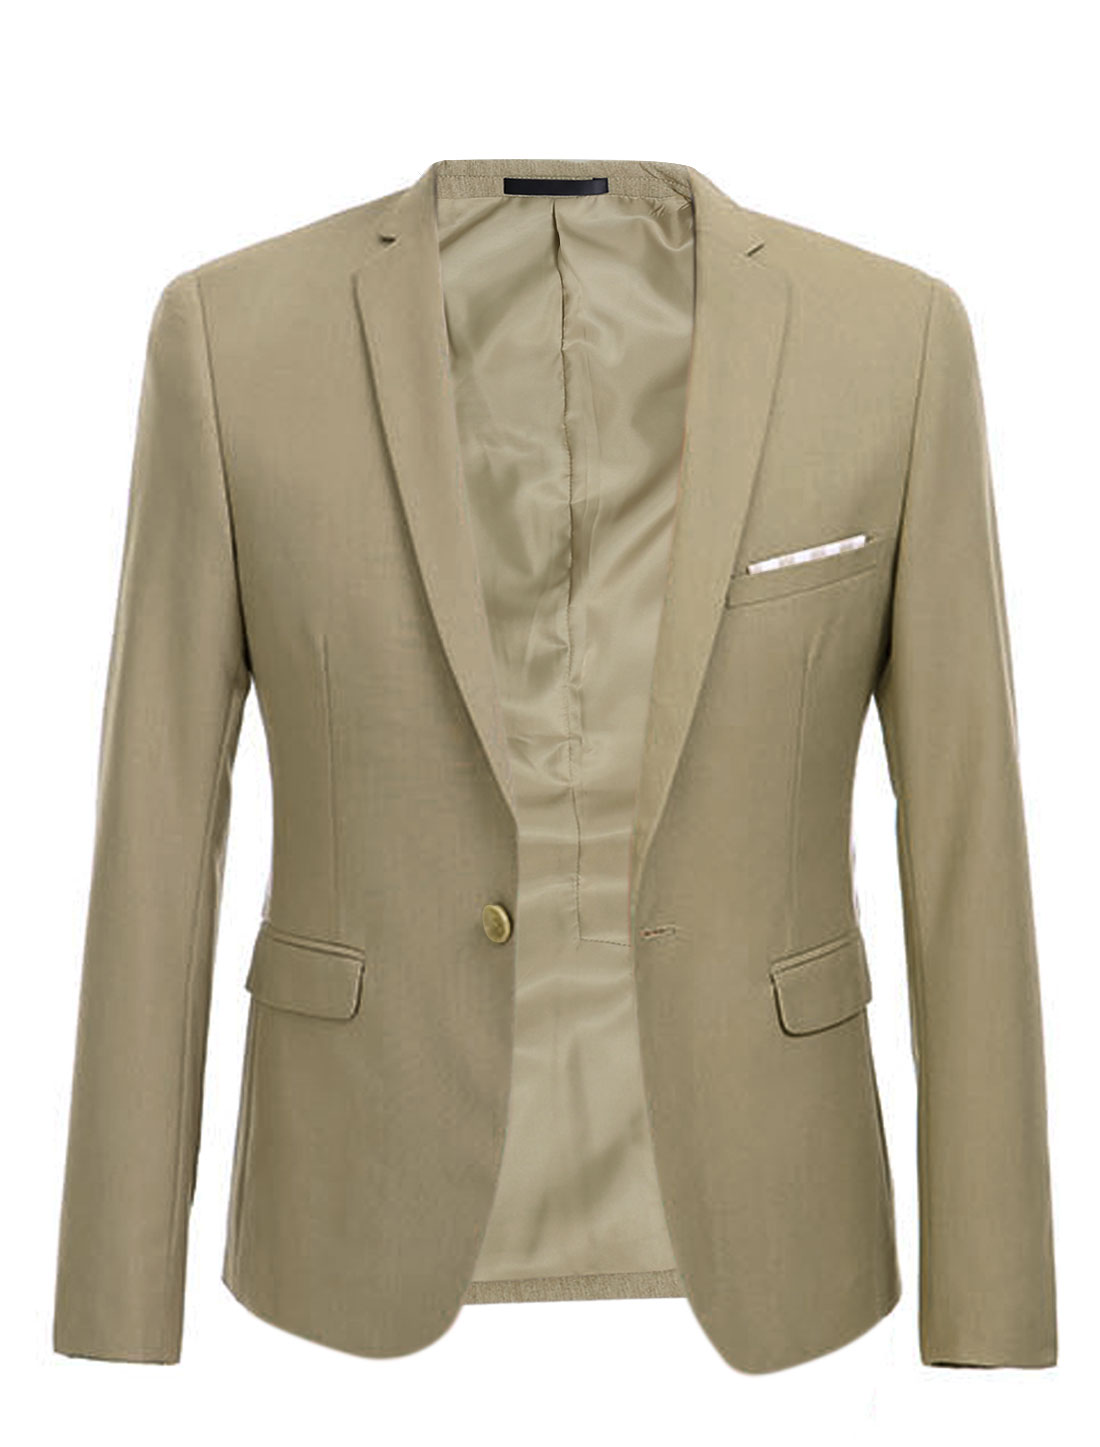 Men Single Breasted Notched Lapel Plaids Blazer Jacket Khaki M